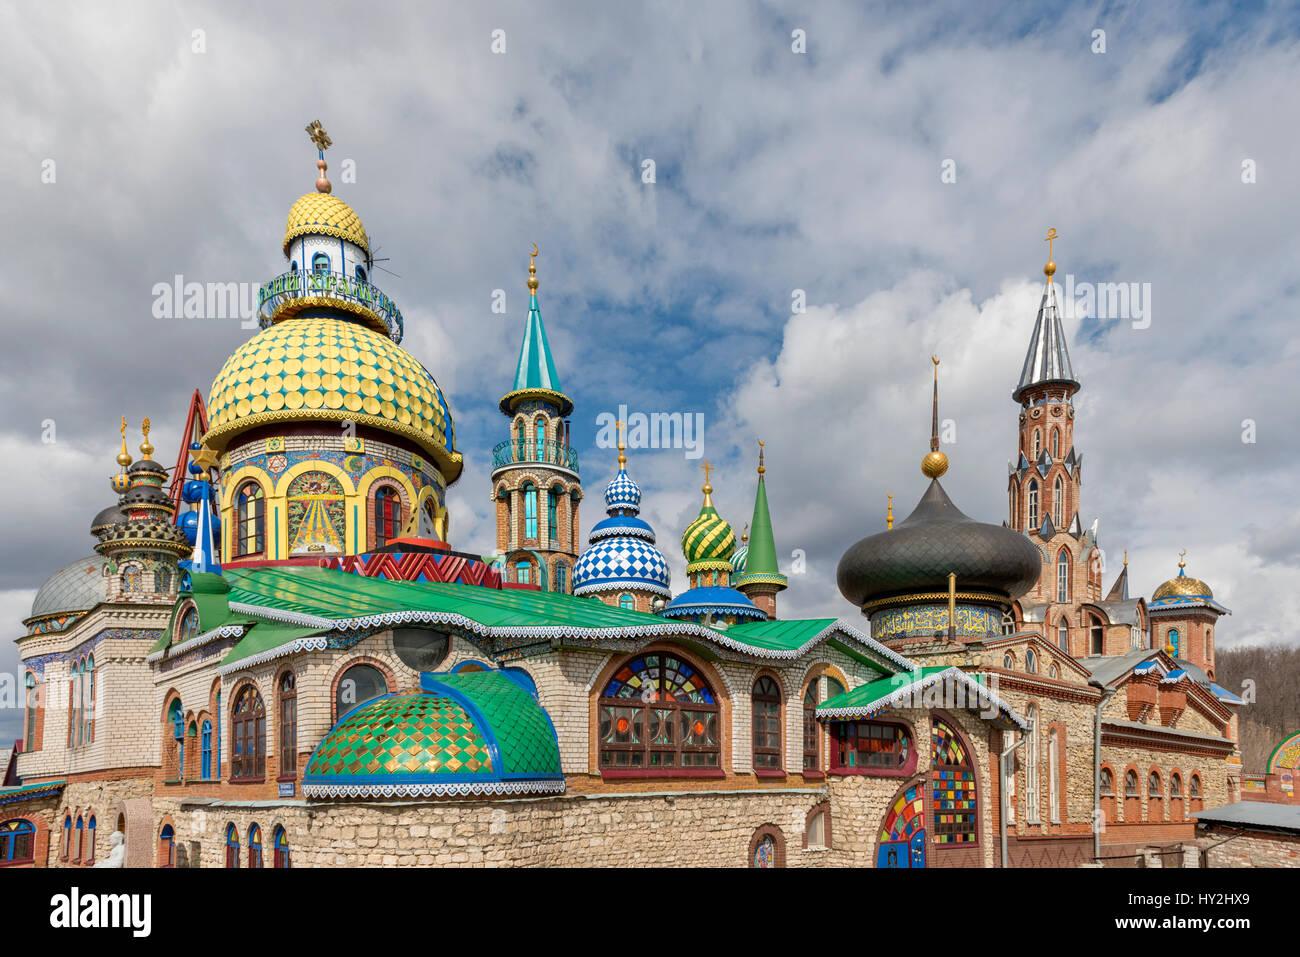 Tempel für alle Religionen Kasaner Kreml Tatarstan Russland Stockbild